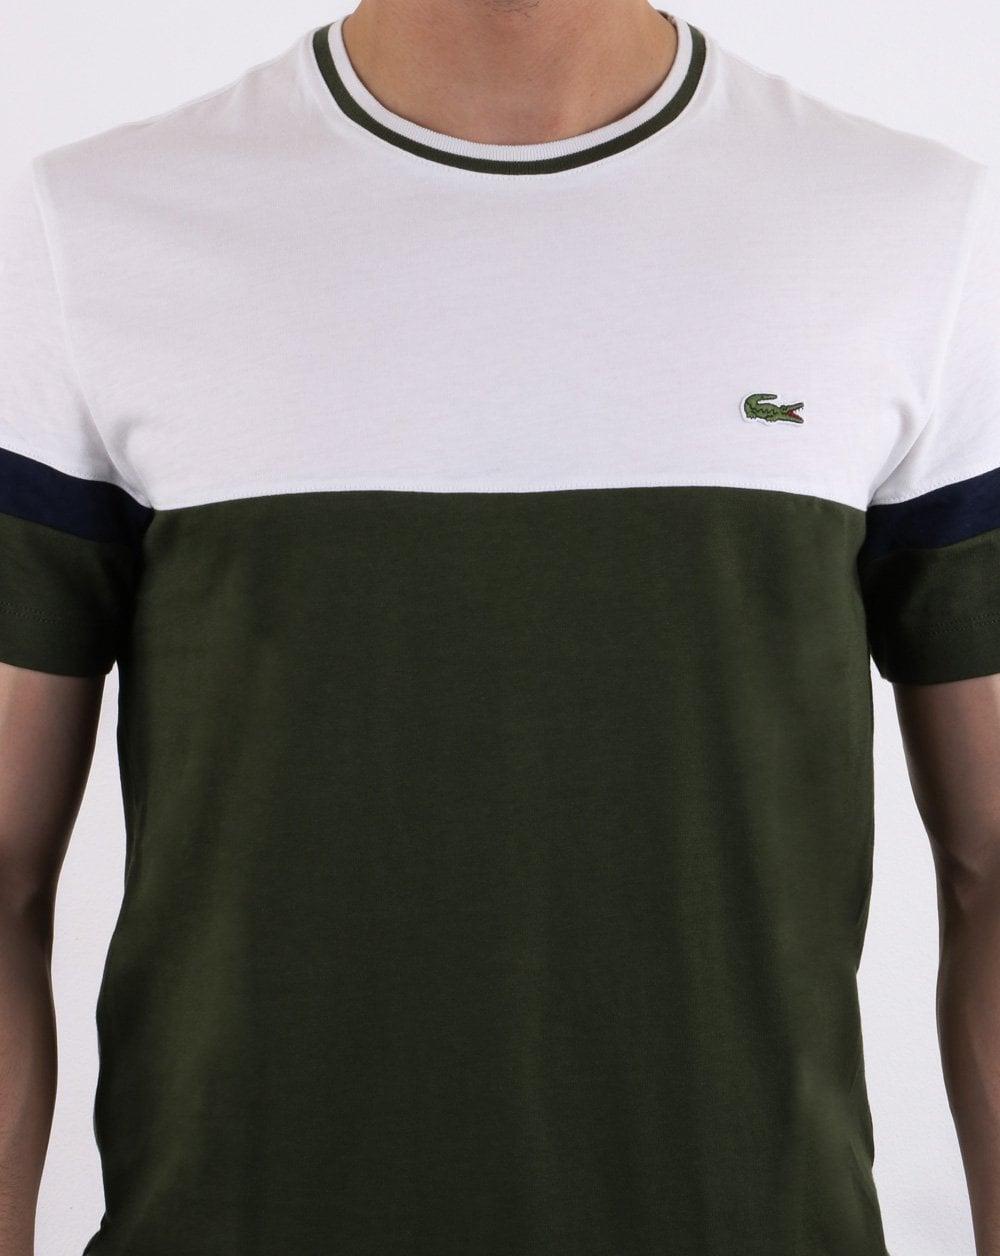 74237b0b Lacoste Logo T Shirt White, Olive, Navy | 80s Casual Classics